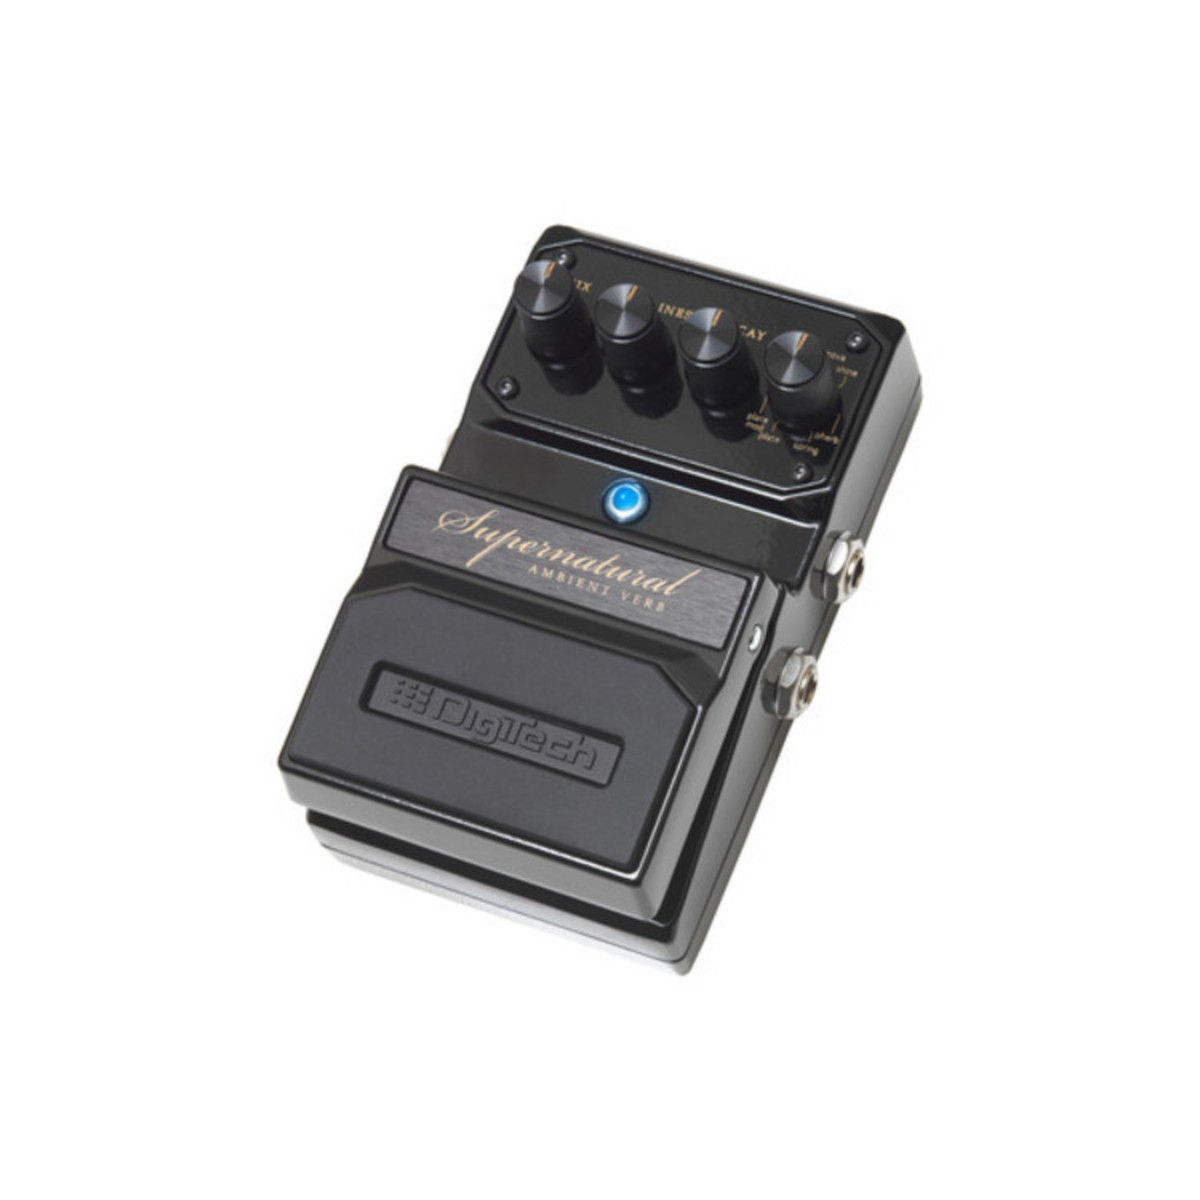 disc digitech supernatural ambient reverb pedal at gear4music. Black Bedroom Furniture Sets. Home Design Ideas